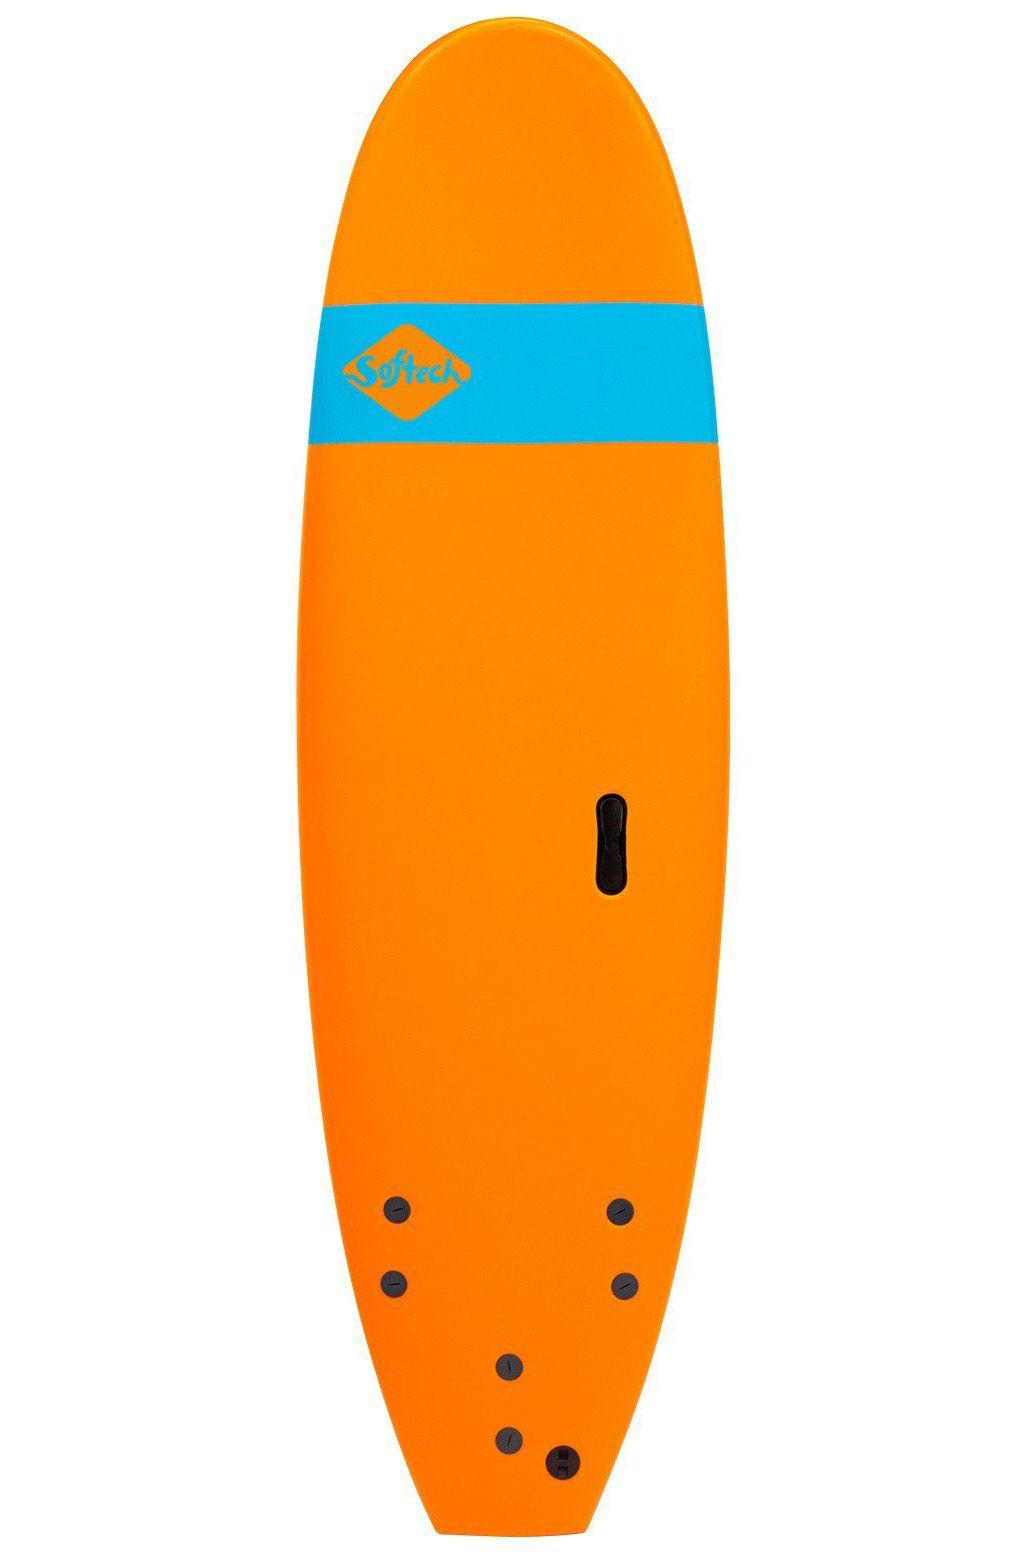 Prancha Surf Softech 7'0 ROLLER ORANGE Square Tail - Color FCS 7ft0